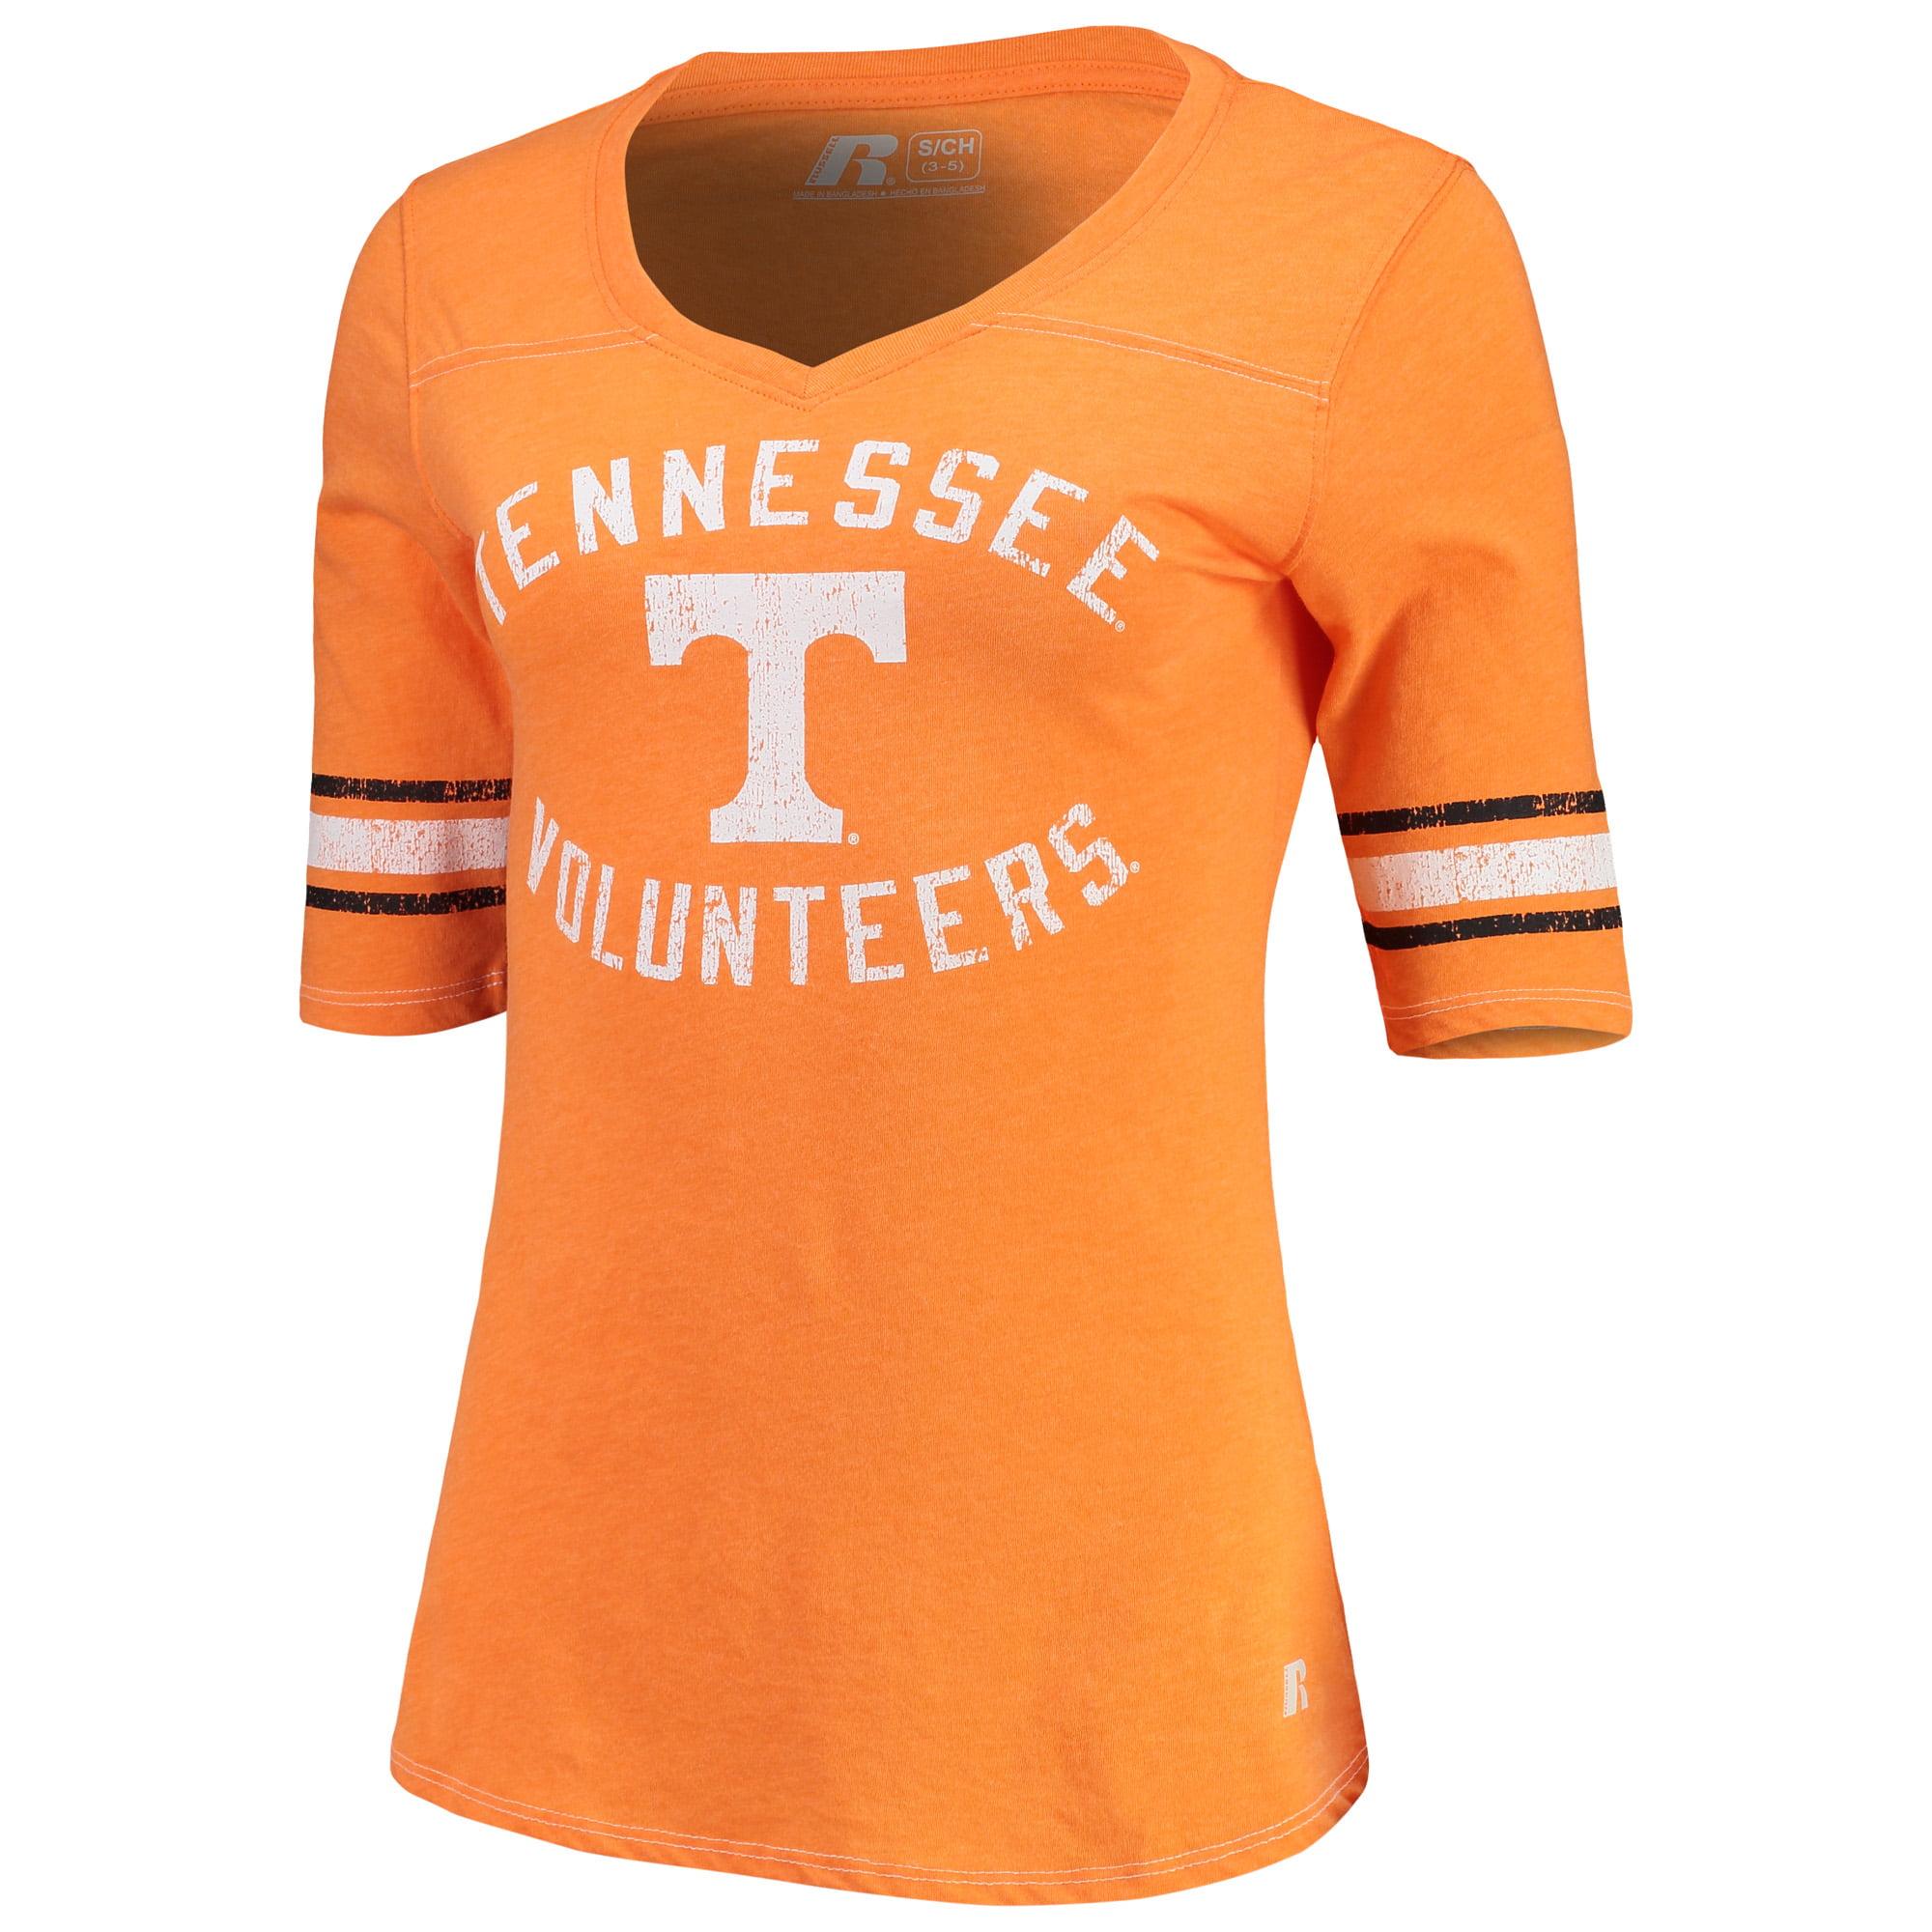 Women's Russell Tennessee Orange Tennessee Volunteers Fan Half-Sleeve V-Neck T-Shirt